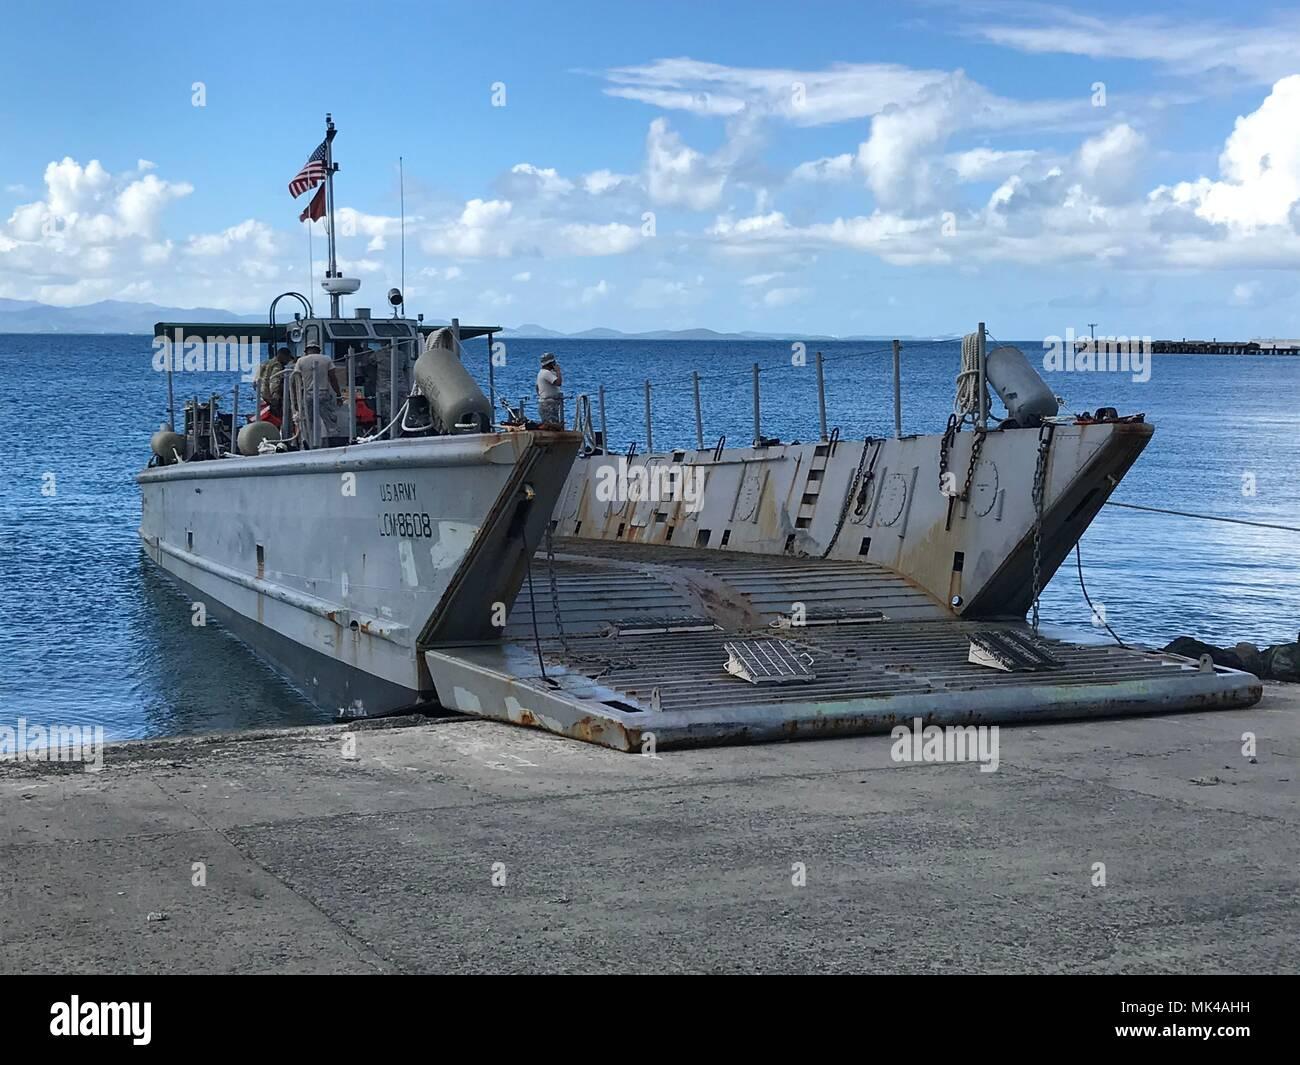 CIEBA, Puerto Rico - A army Landing Craft Mechanized